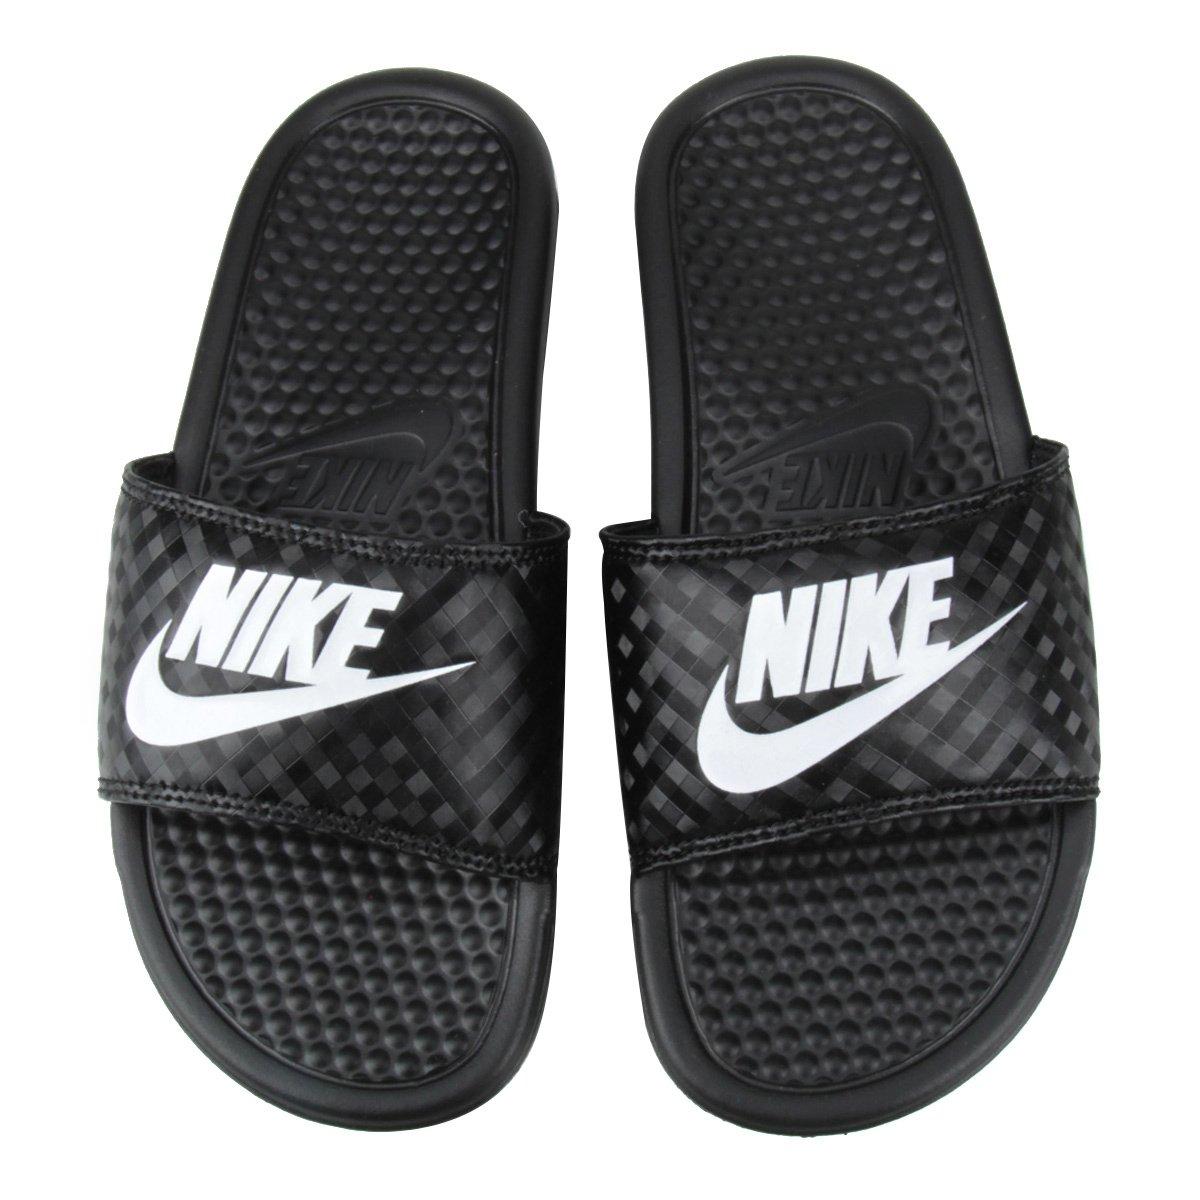 92259ba552a Chinelo Nike Benassi JDI Slide Feminina - Preto e Branco - Compre Agora